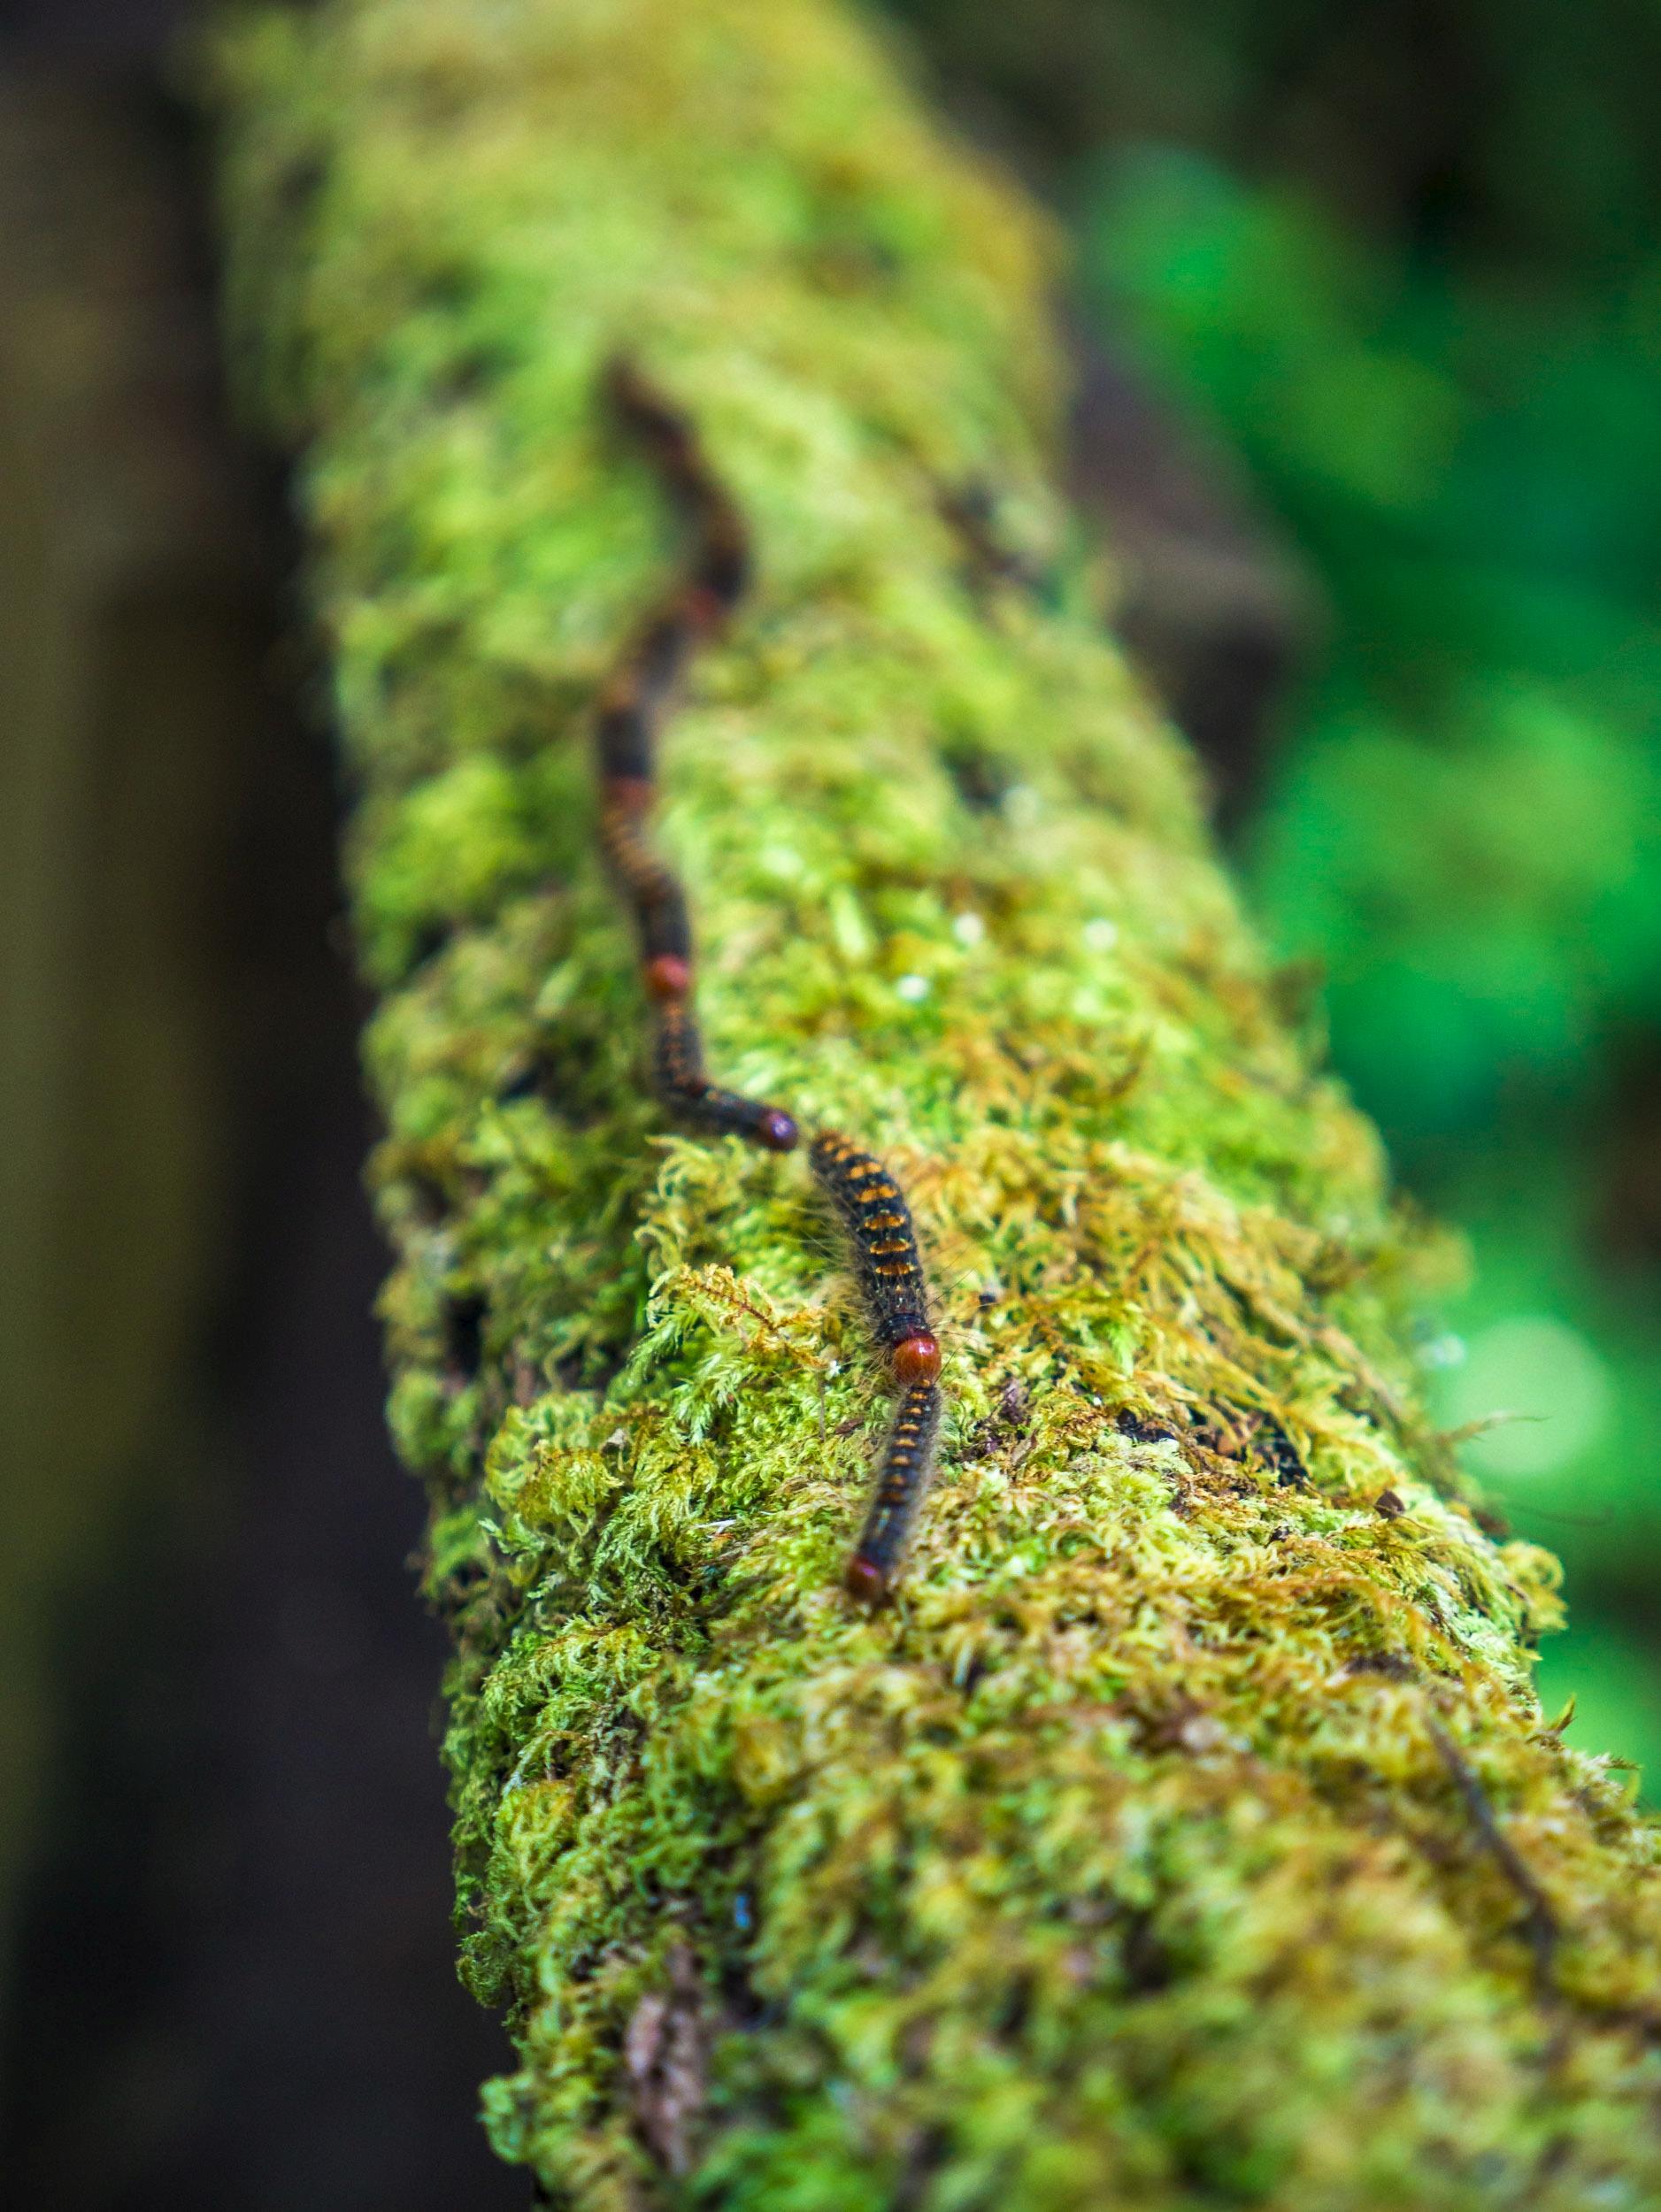 Preceding Caterpillar, Chiangma - travischau | ello